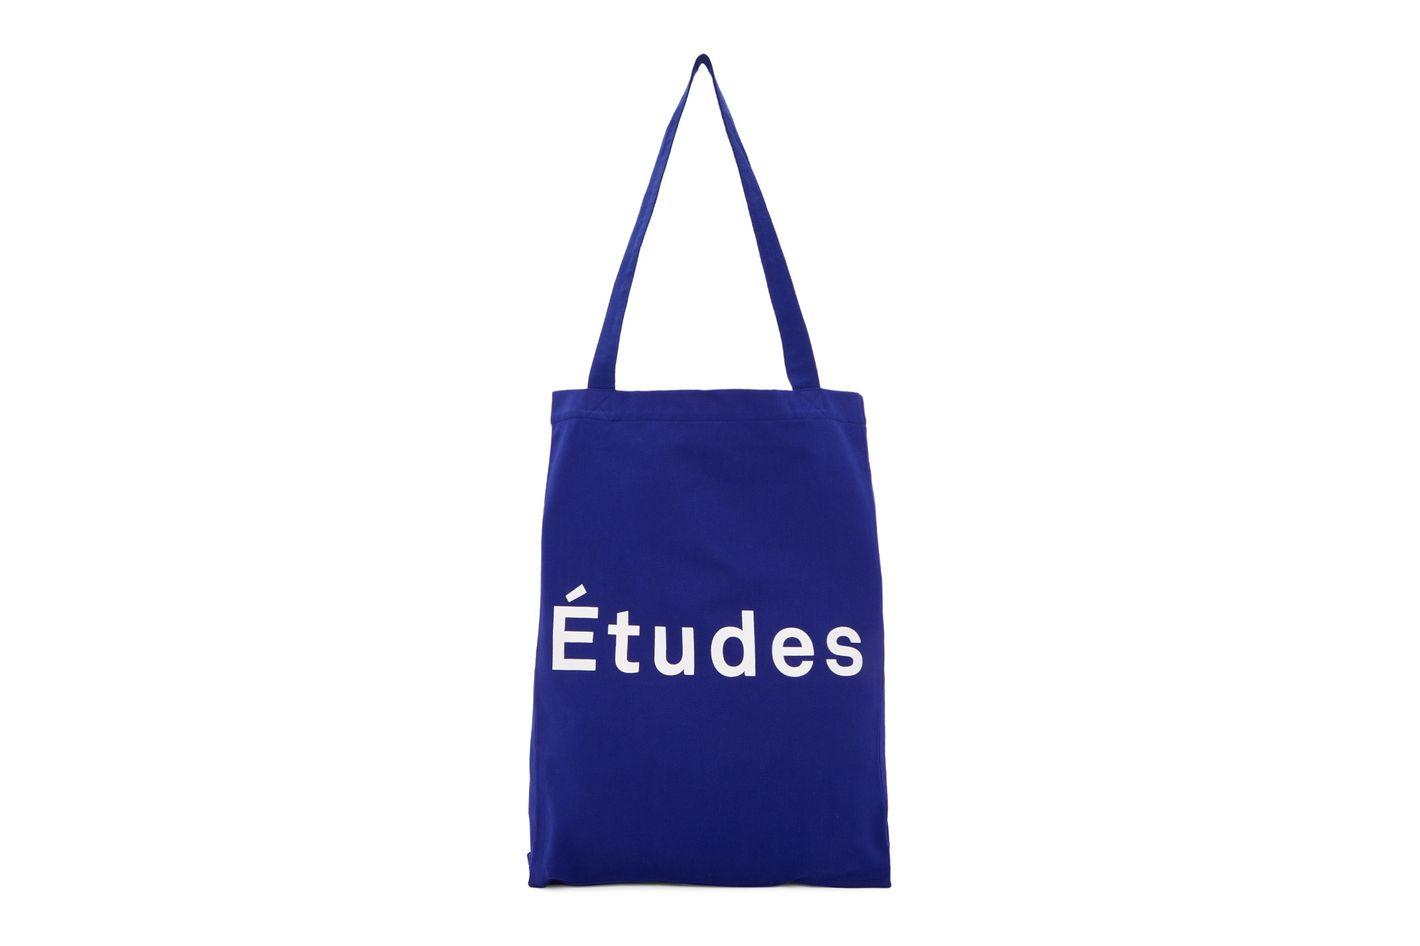 Etudes Blue October Tote